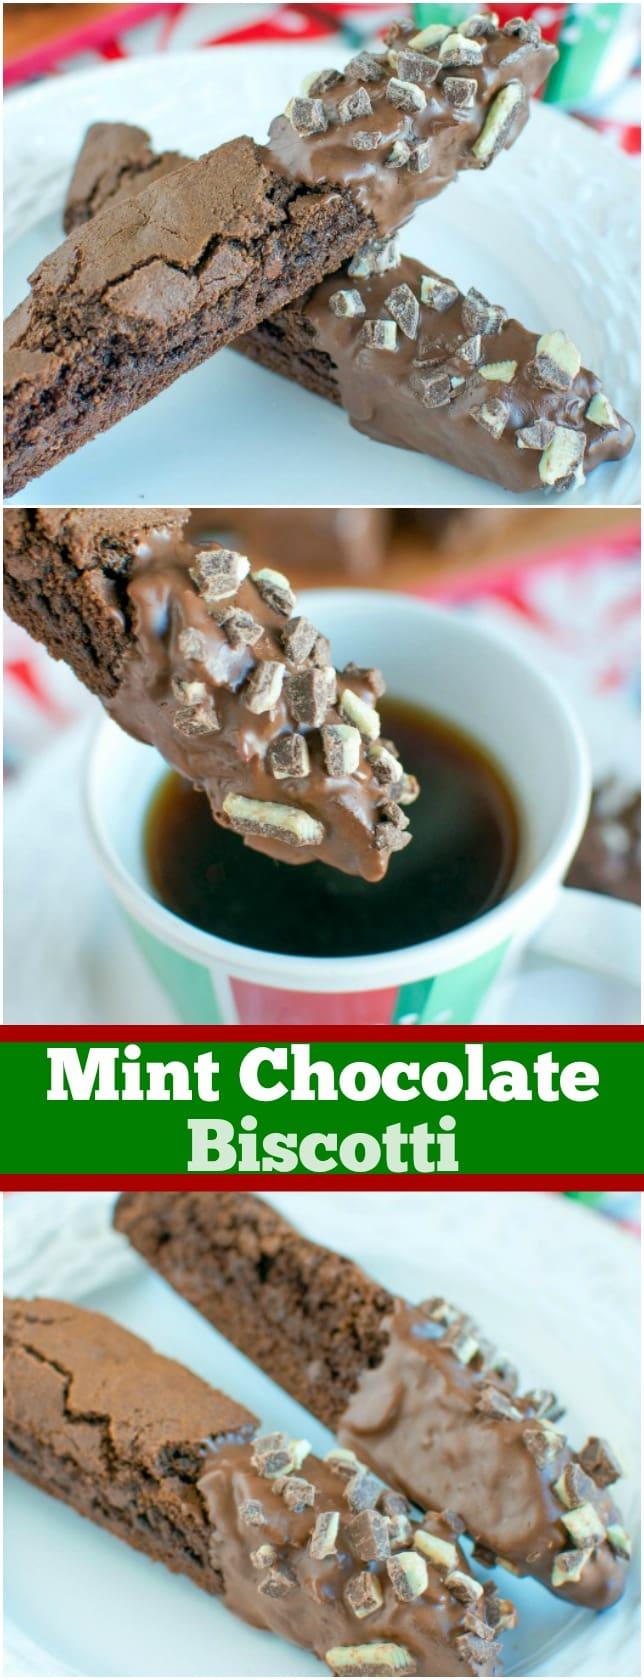 Mint Chocolate Biscotti